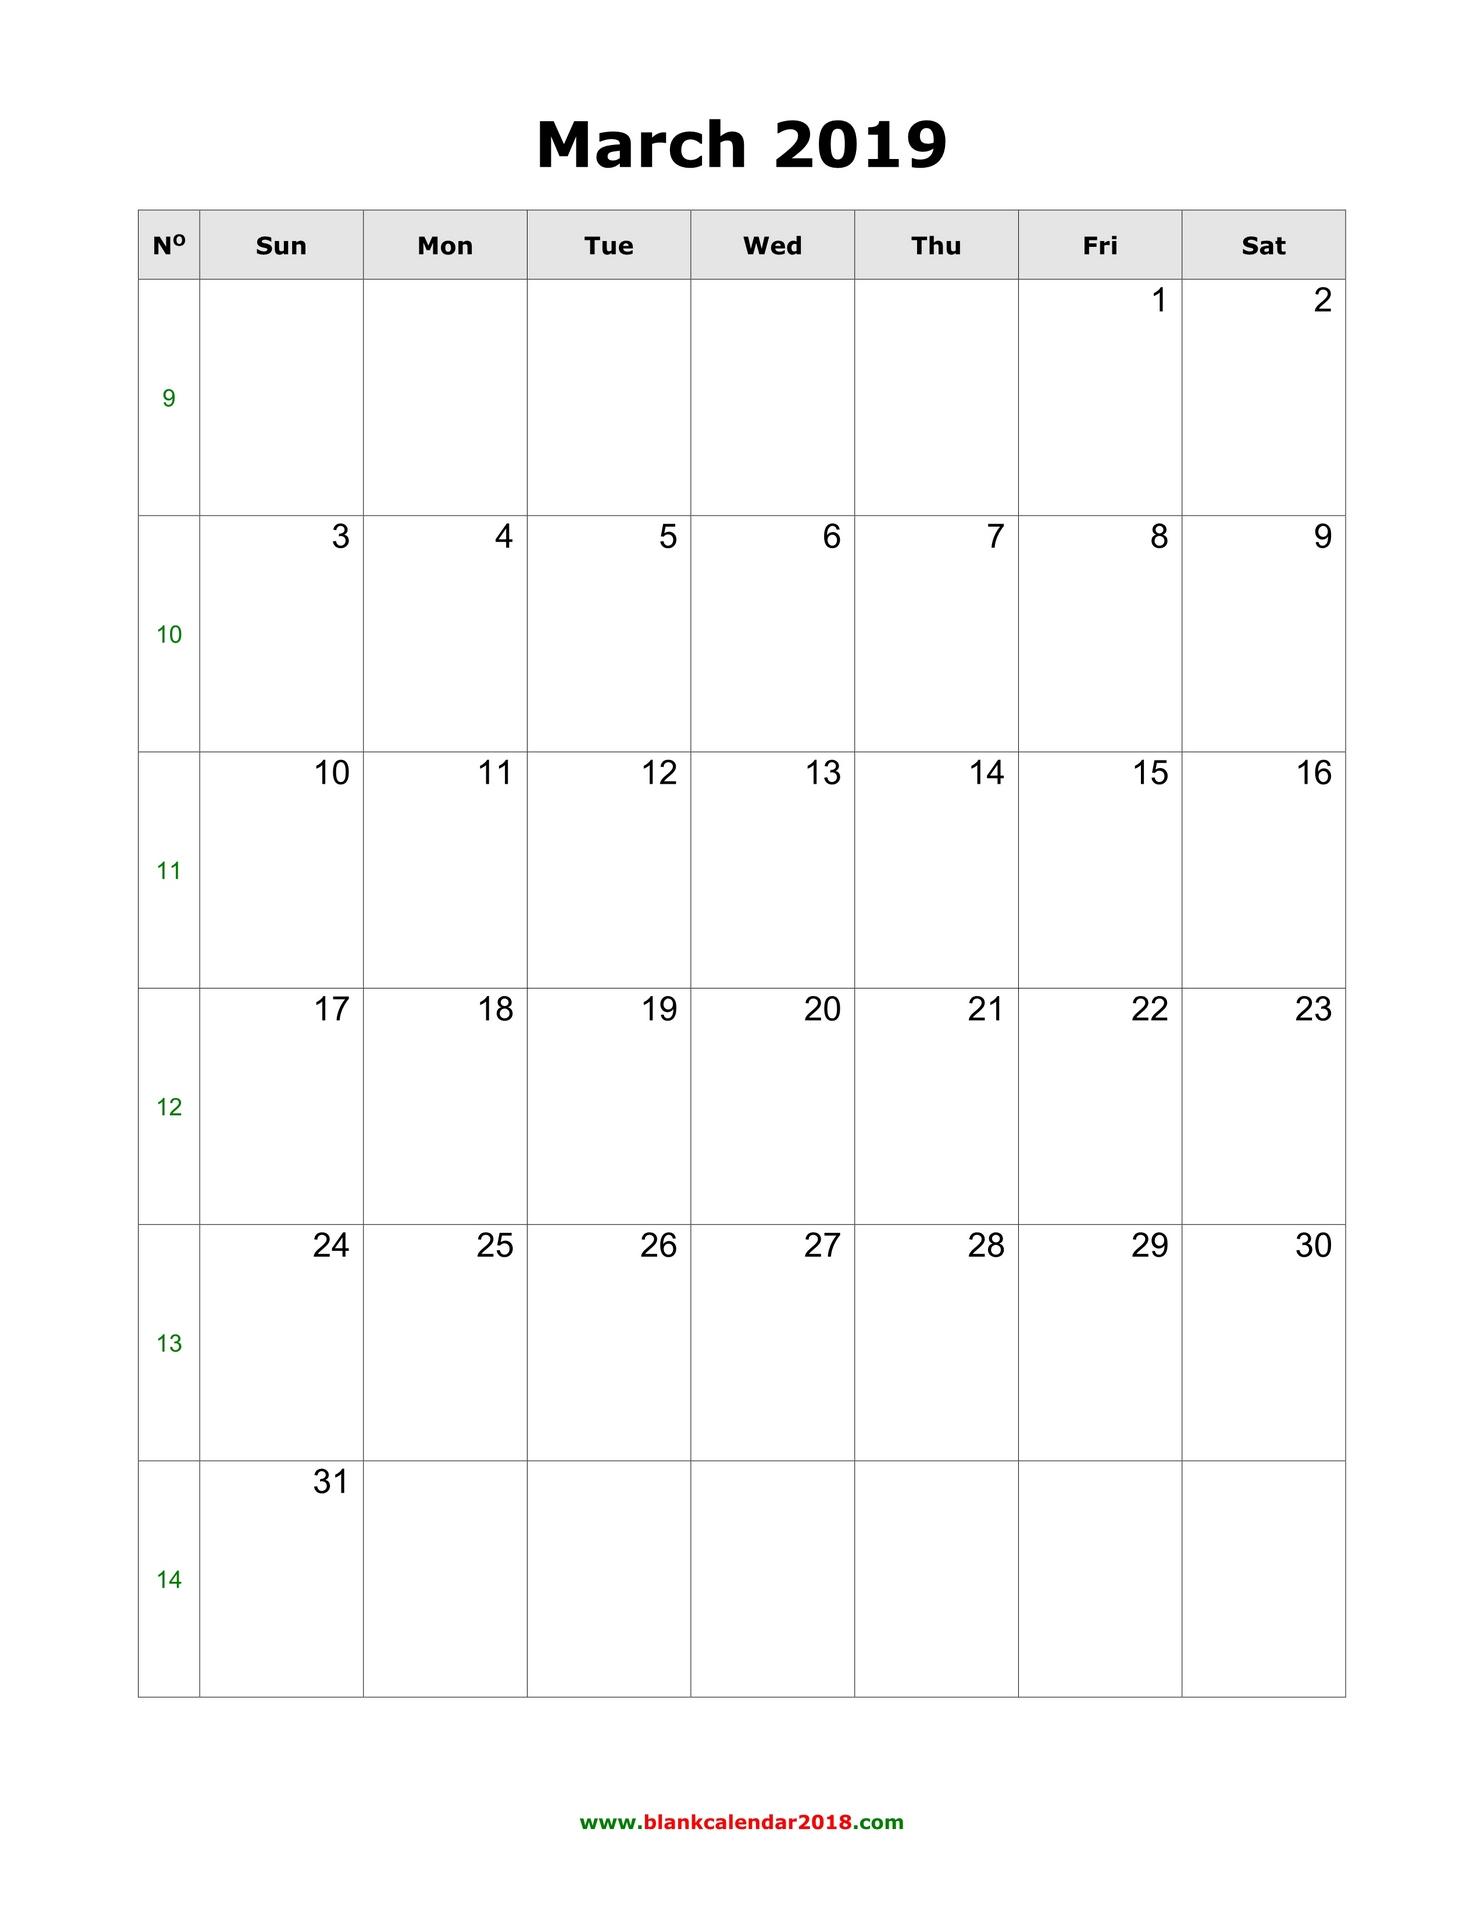 Blank March 2019 Calendar Portrait